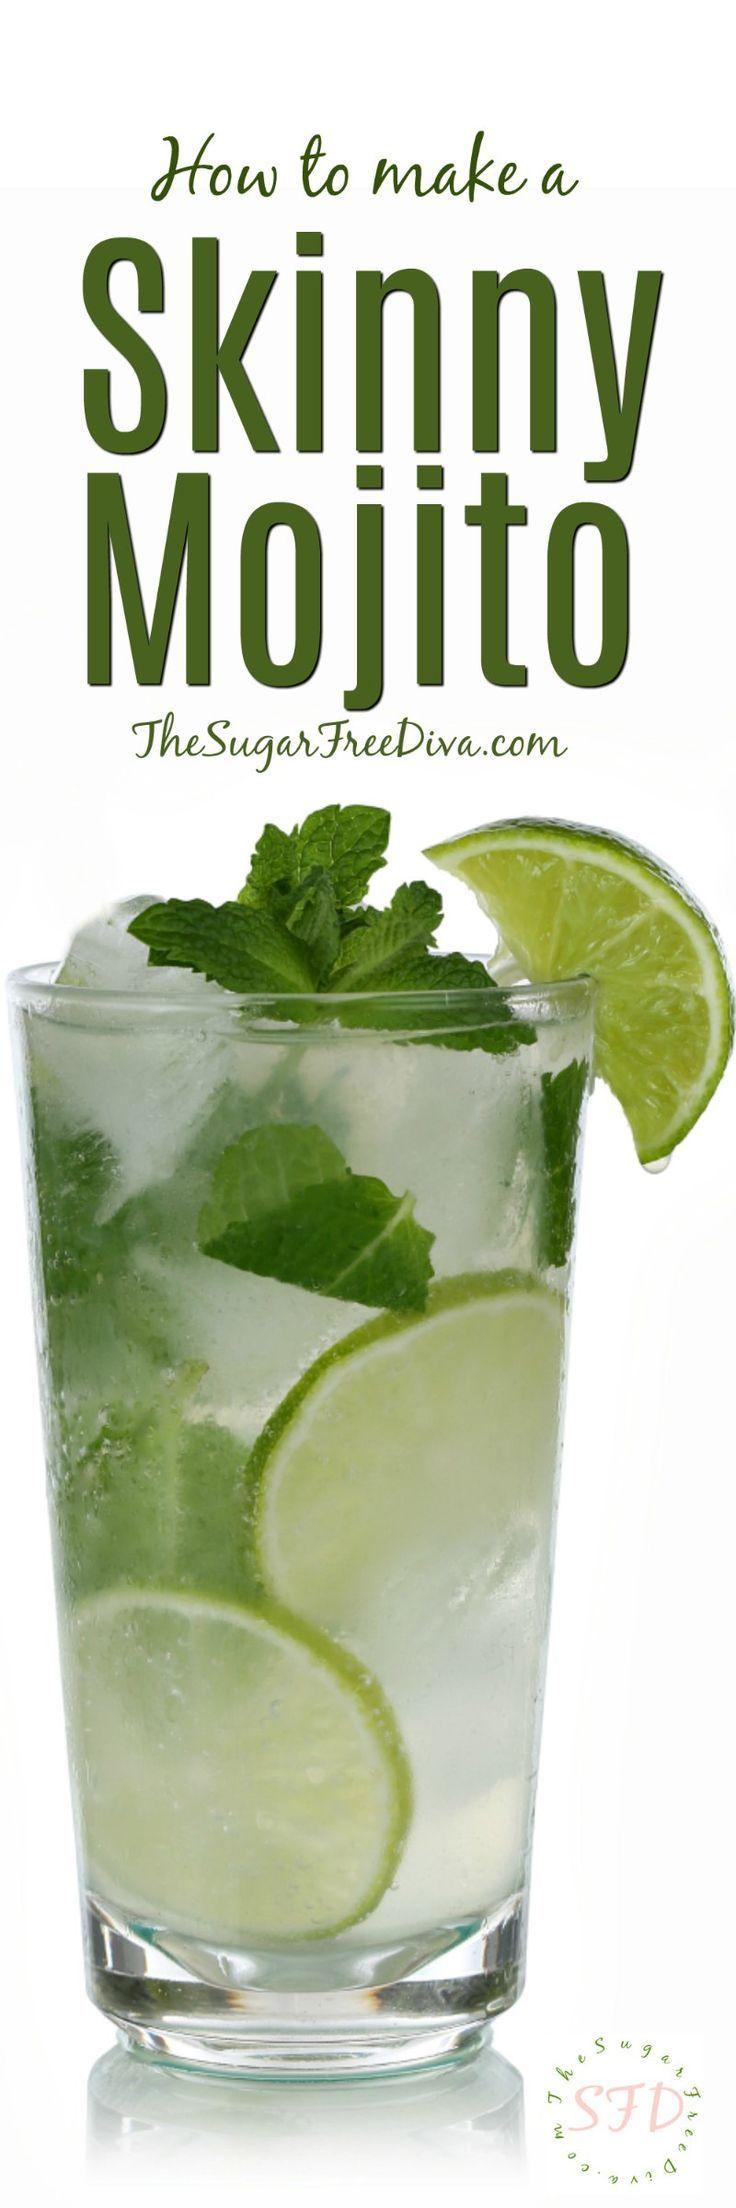 How to Make a Skinny Mojito- Sugar Free Recipe!!